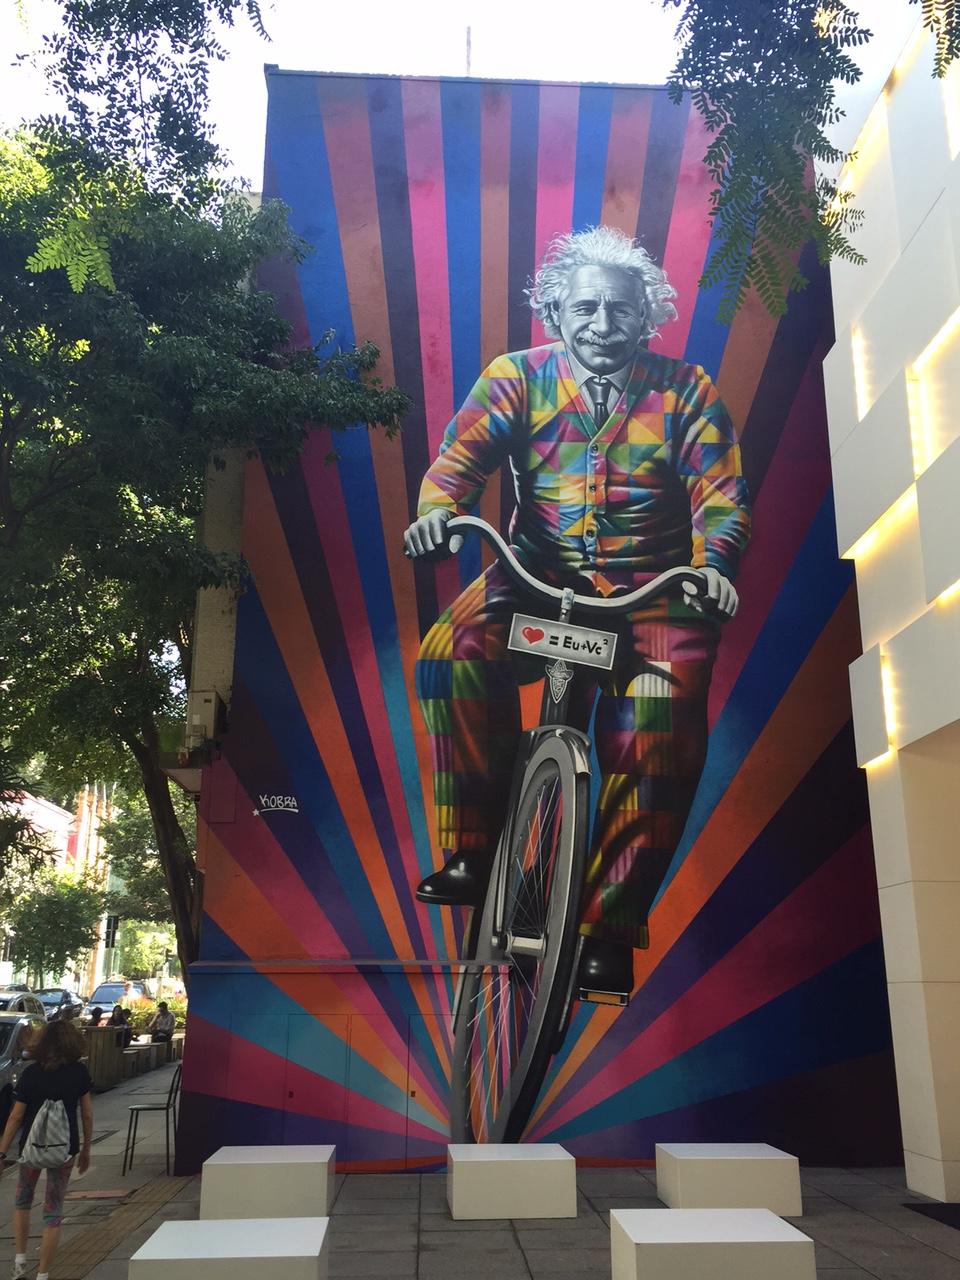 Edoardo Kobra Paints A New Mural In Sao Paulo Brazil